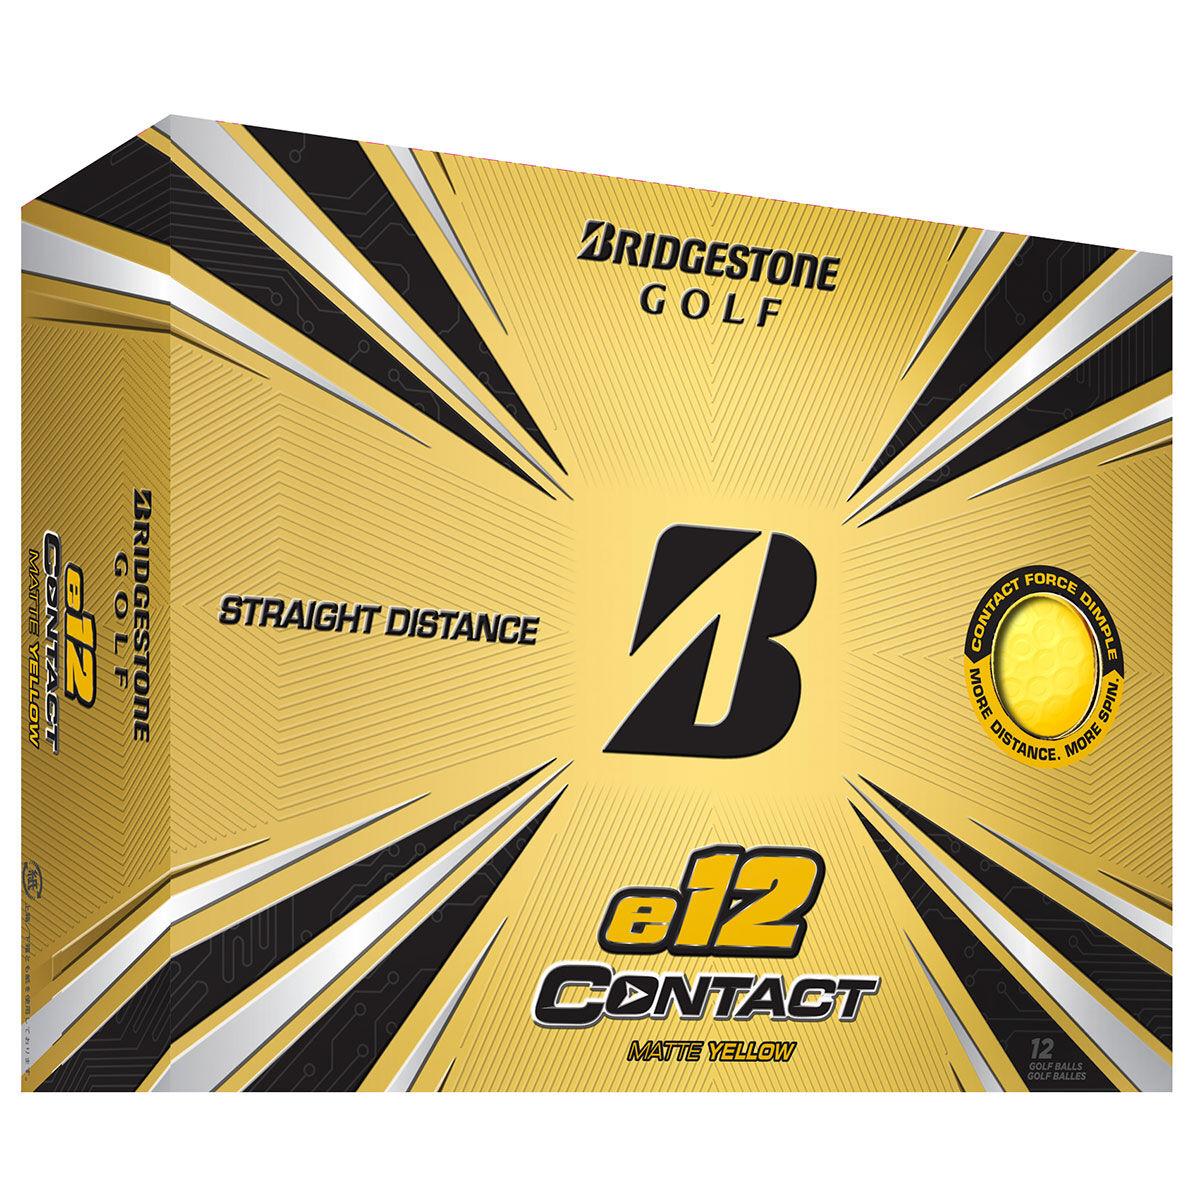 Bridgestone Golf e12 CONTACT 12 Ball Pack, Male, Yellow | American Golf